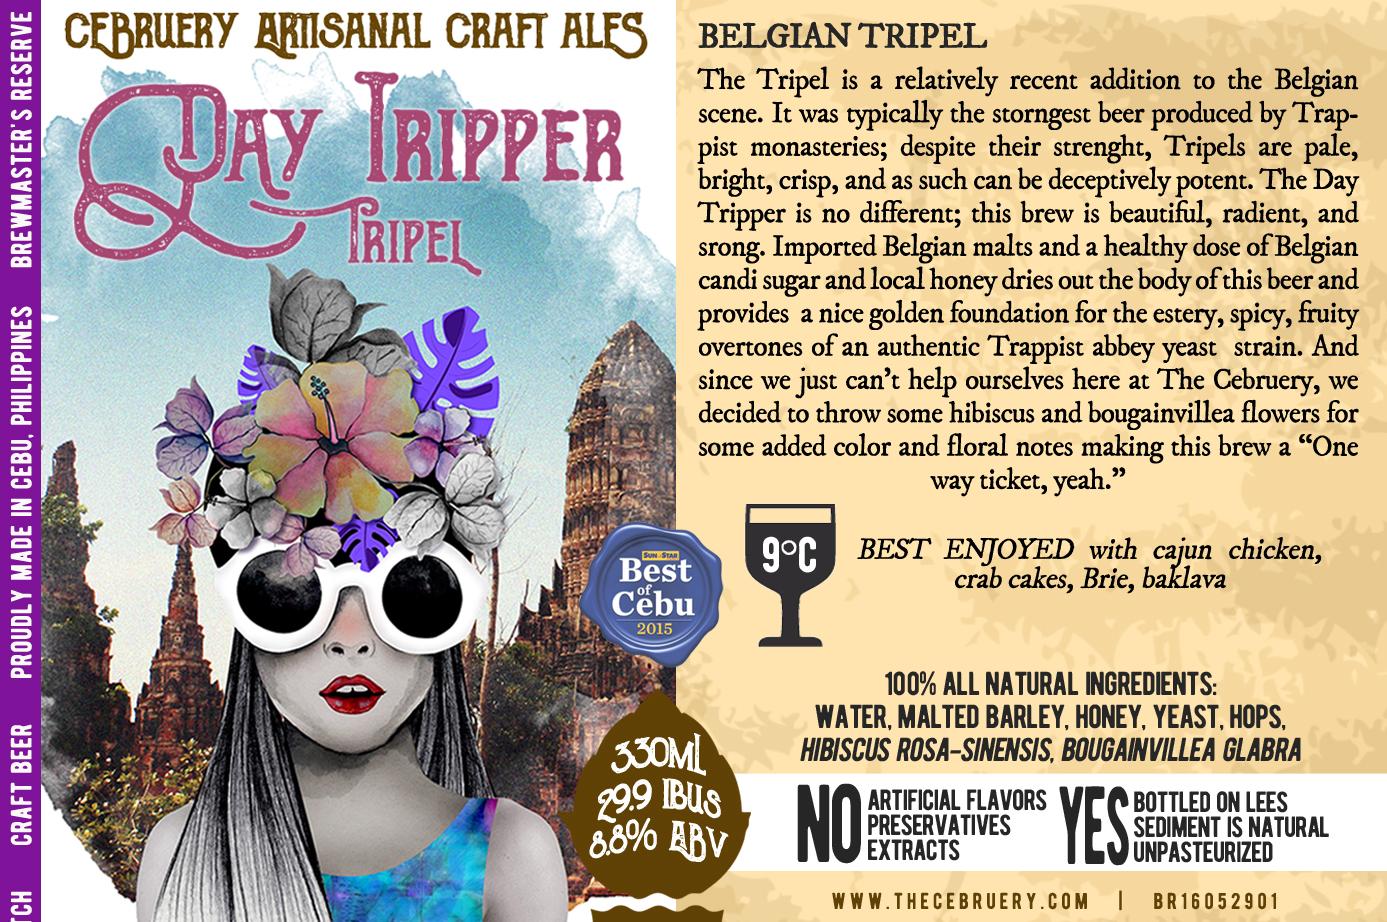 day-tripper-tripel